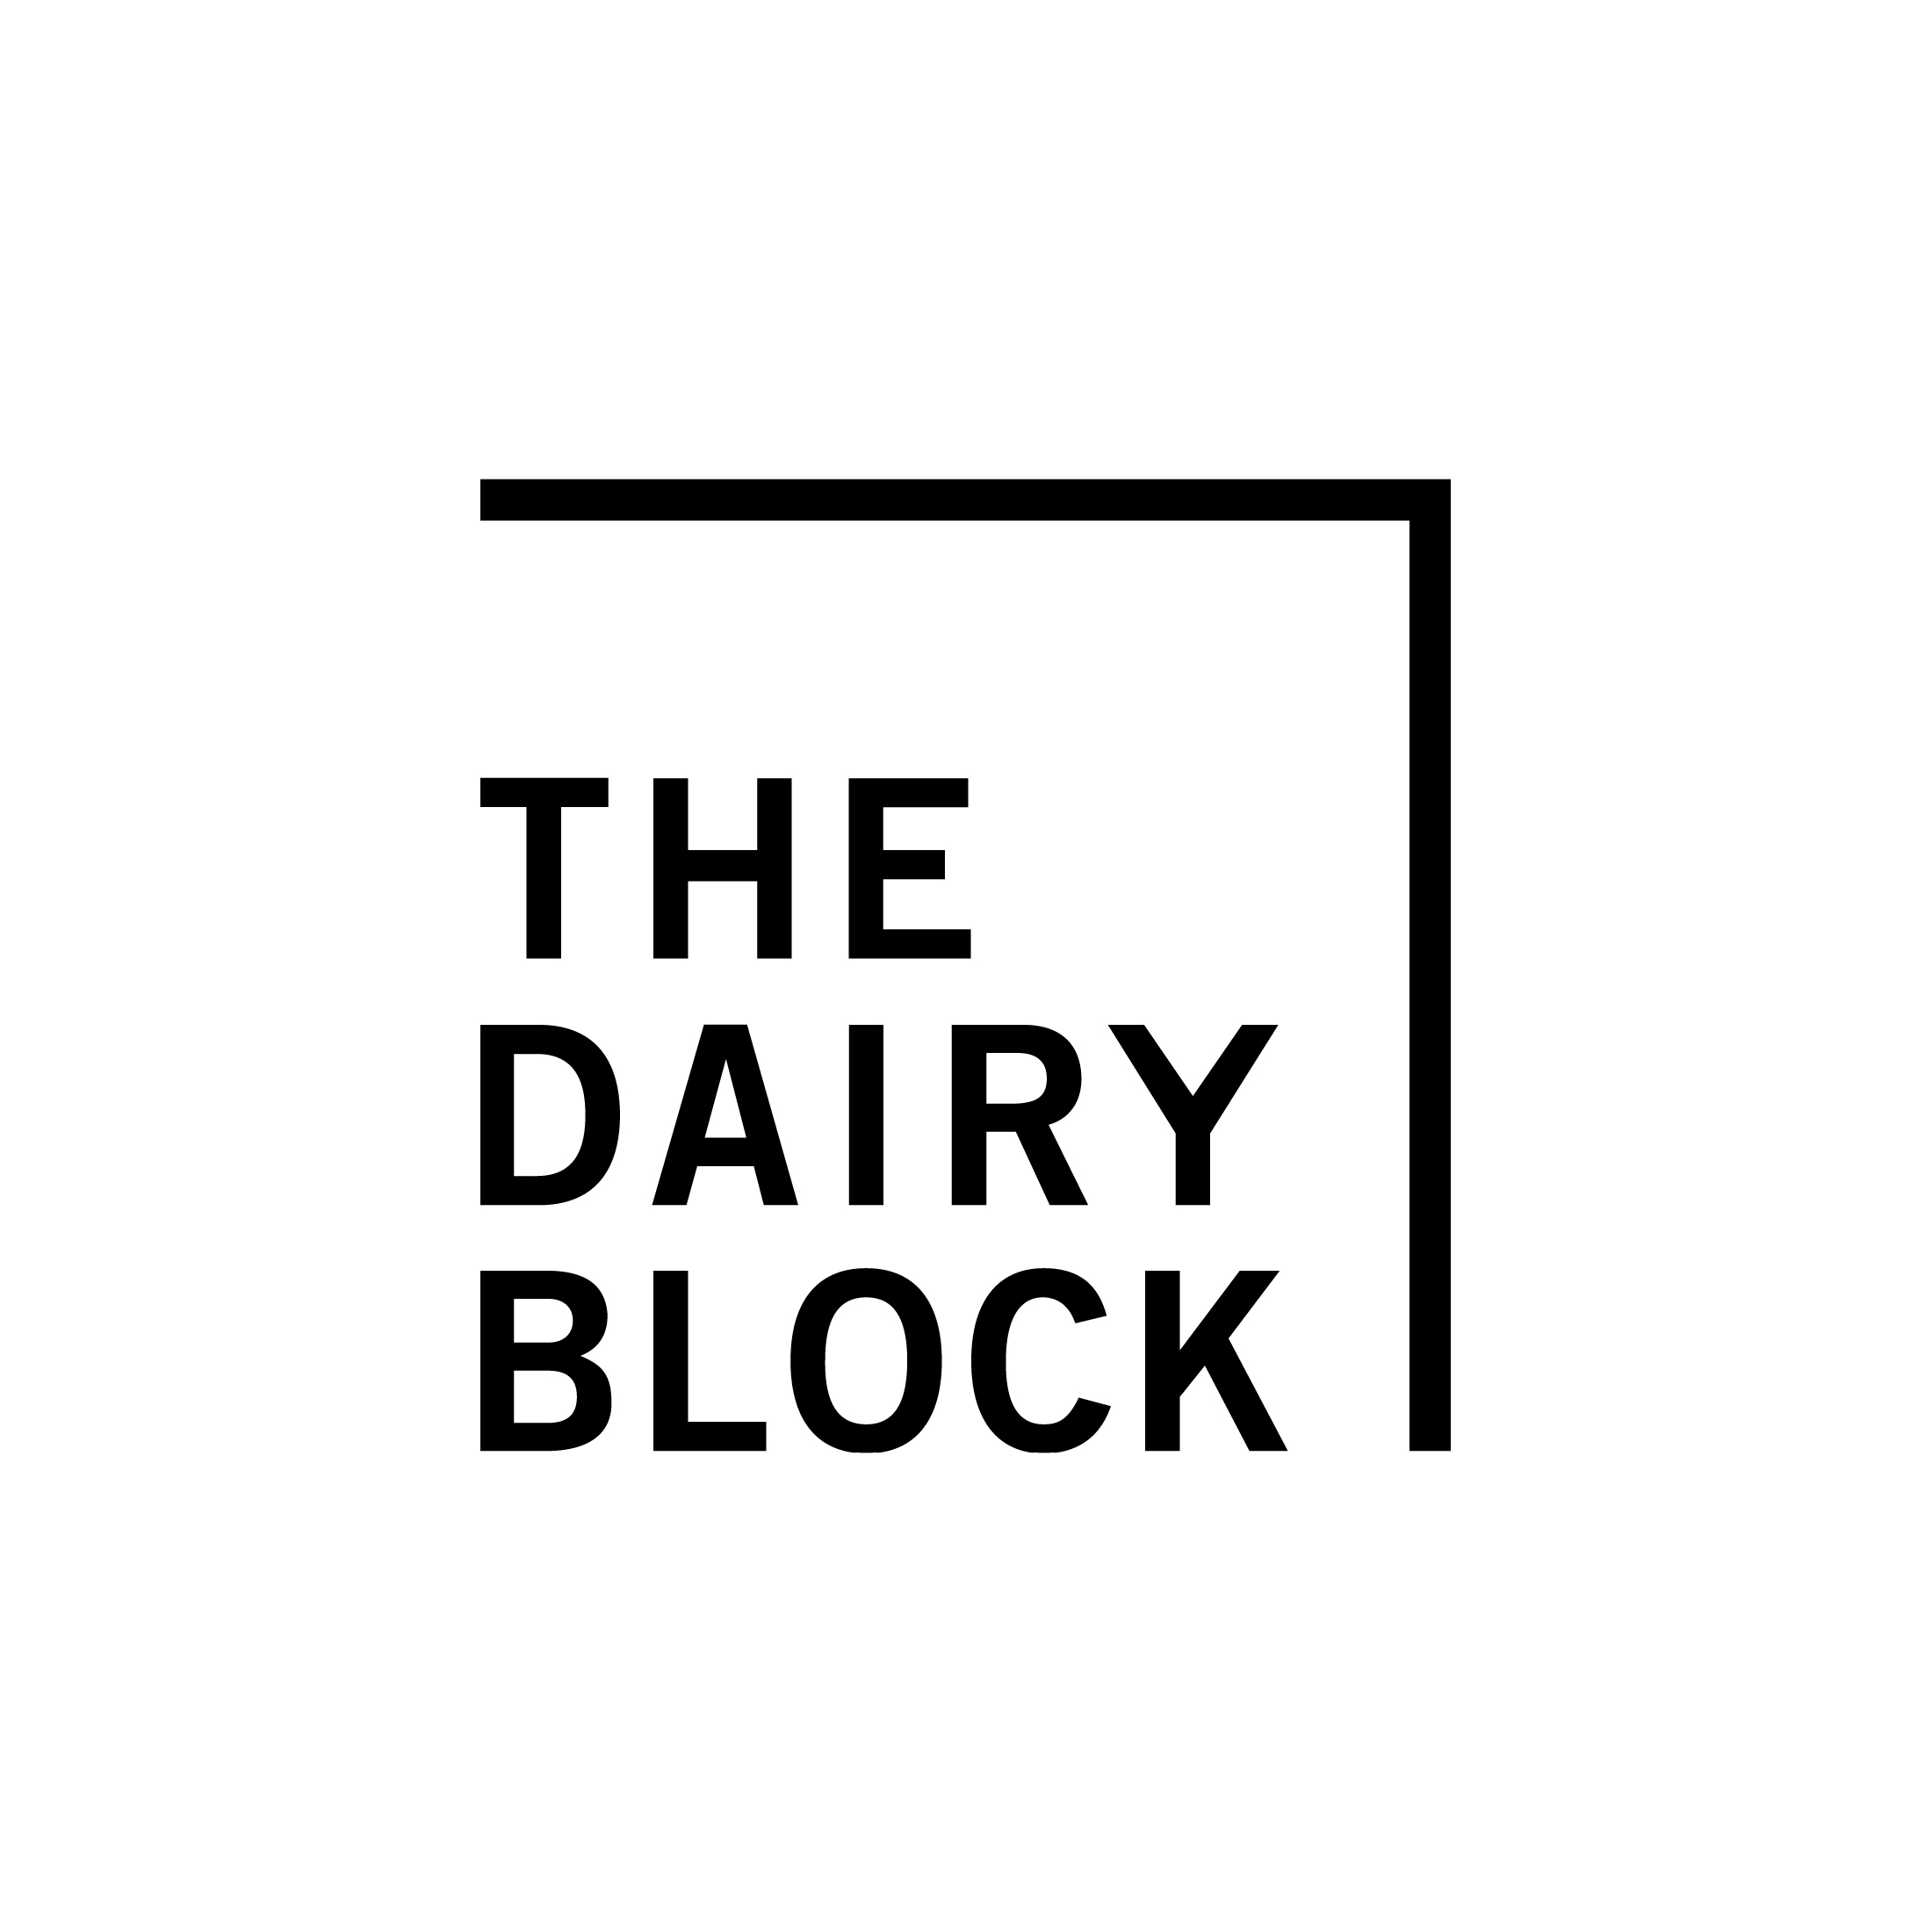 DAIRY BLOCK LOGO.jpg